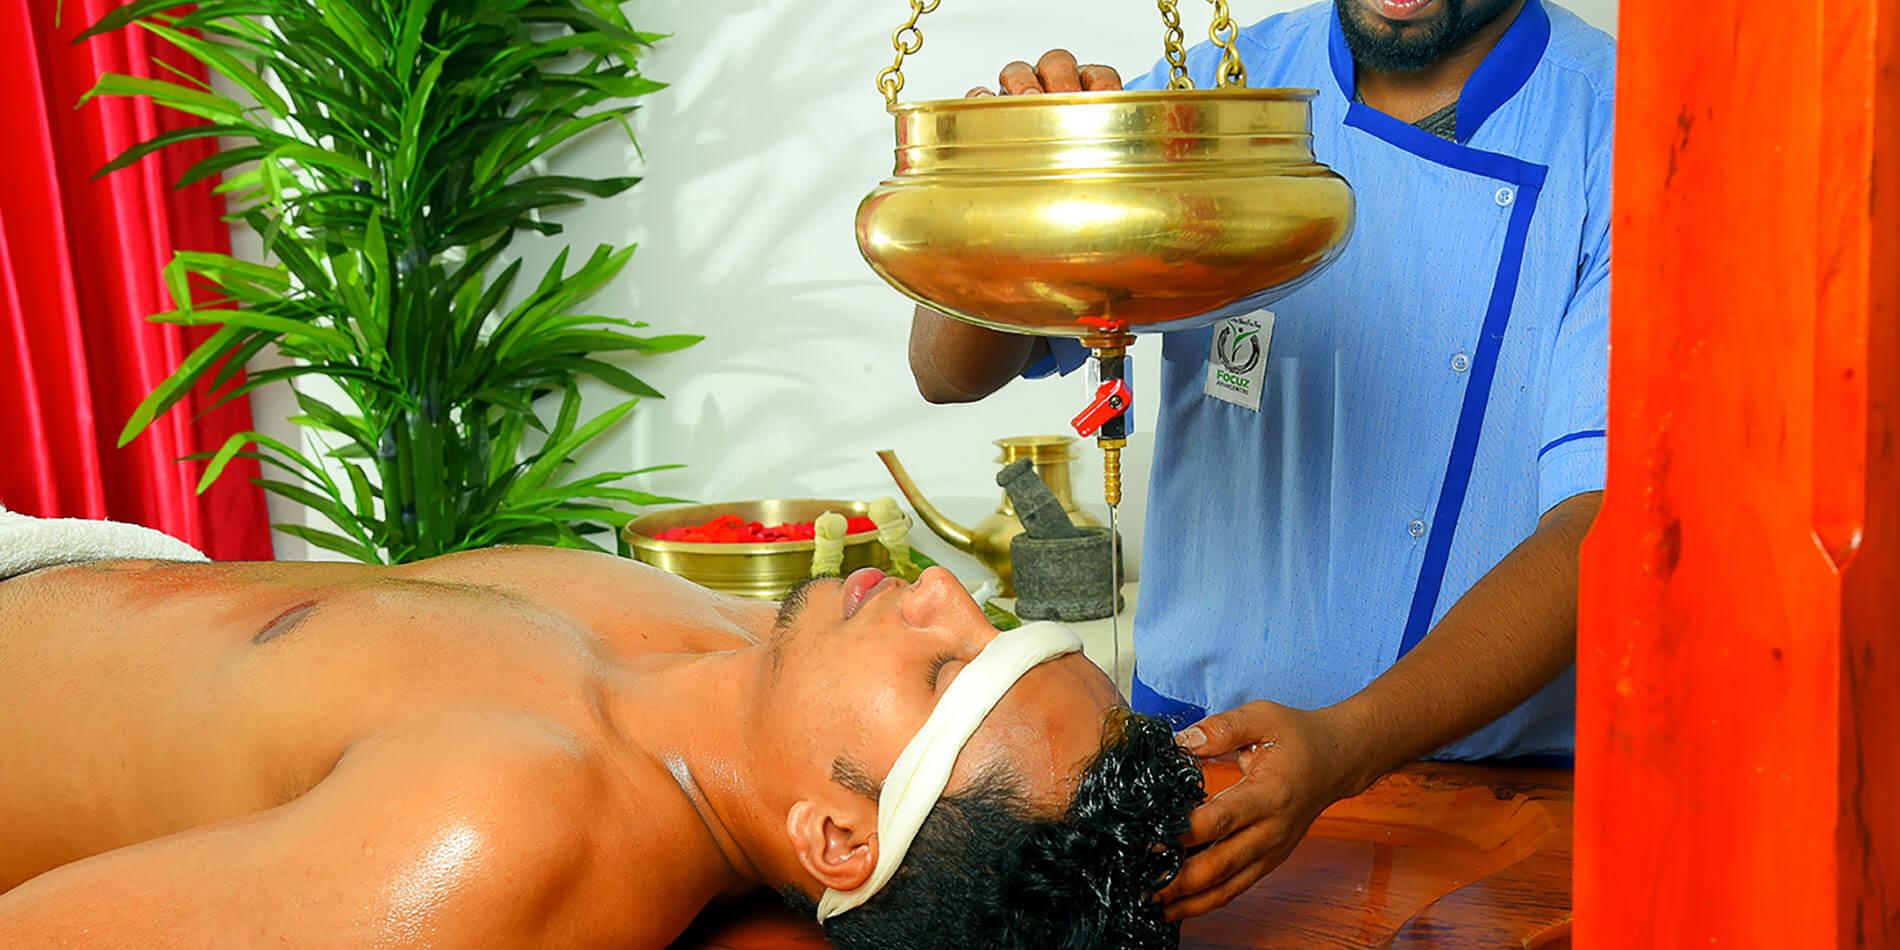 Shirodhara Ayurvedic Treatment Kerala, India